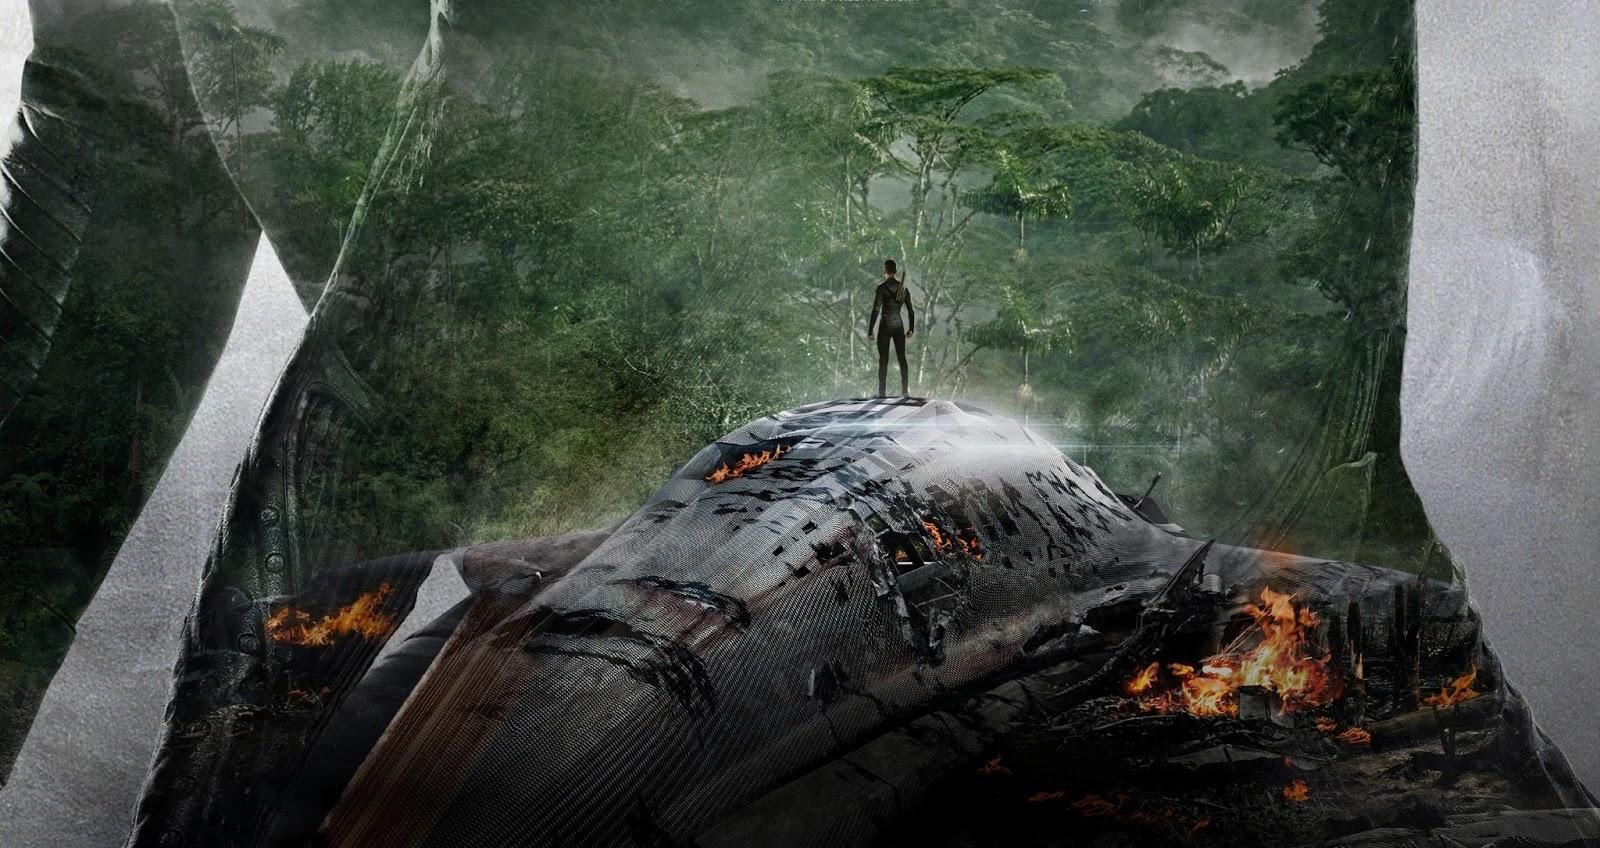 Hollywood Movies Hd Wallpapers: Pic Famina: After Earth Hollywood Movie Hd Wallpapers